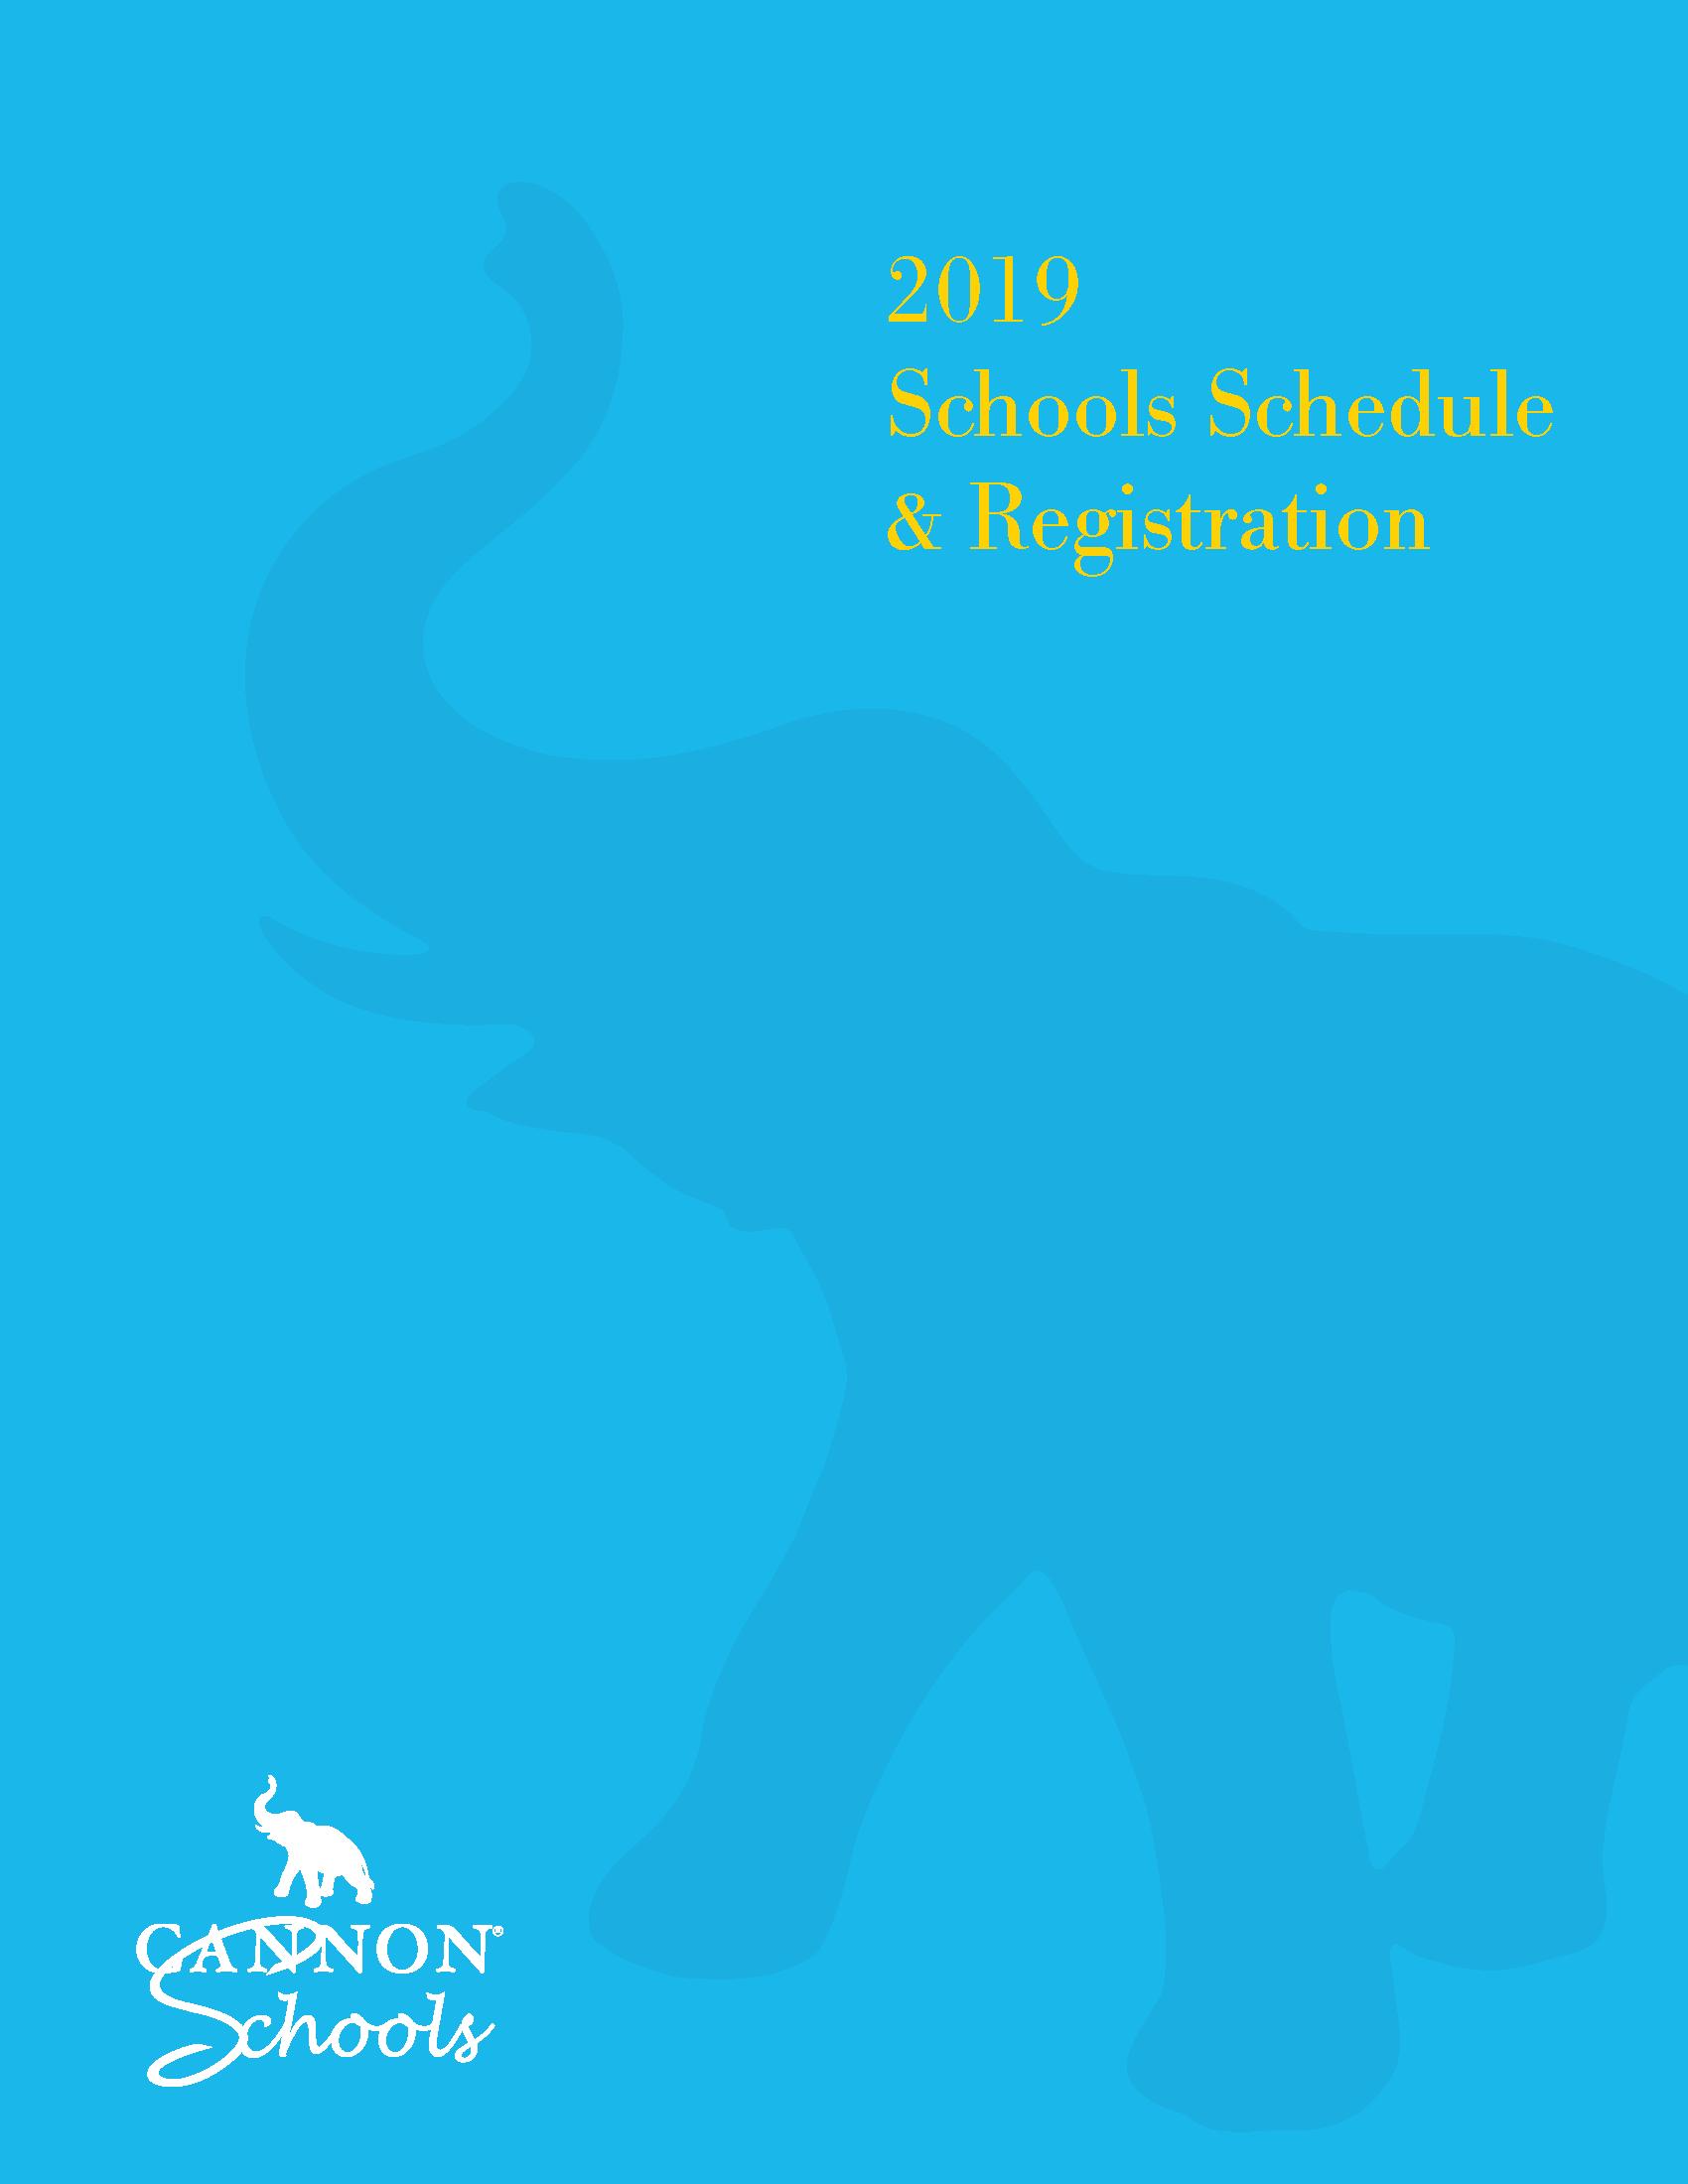 2019 Schools Preview